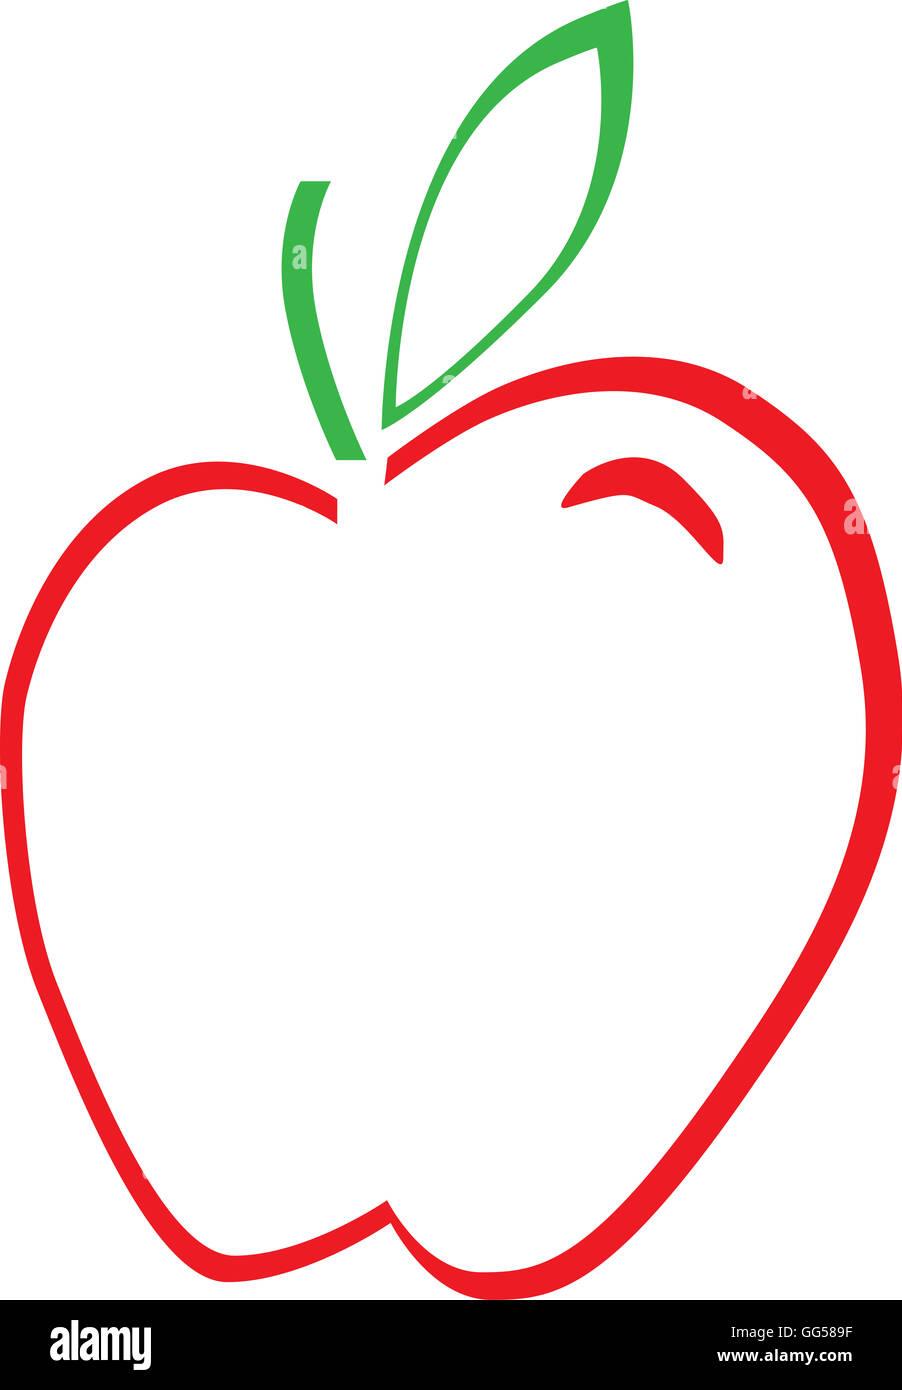 School Apple Logo - Stock Image